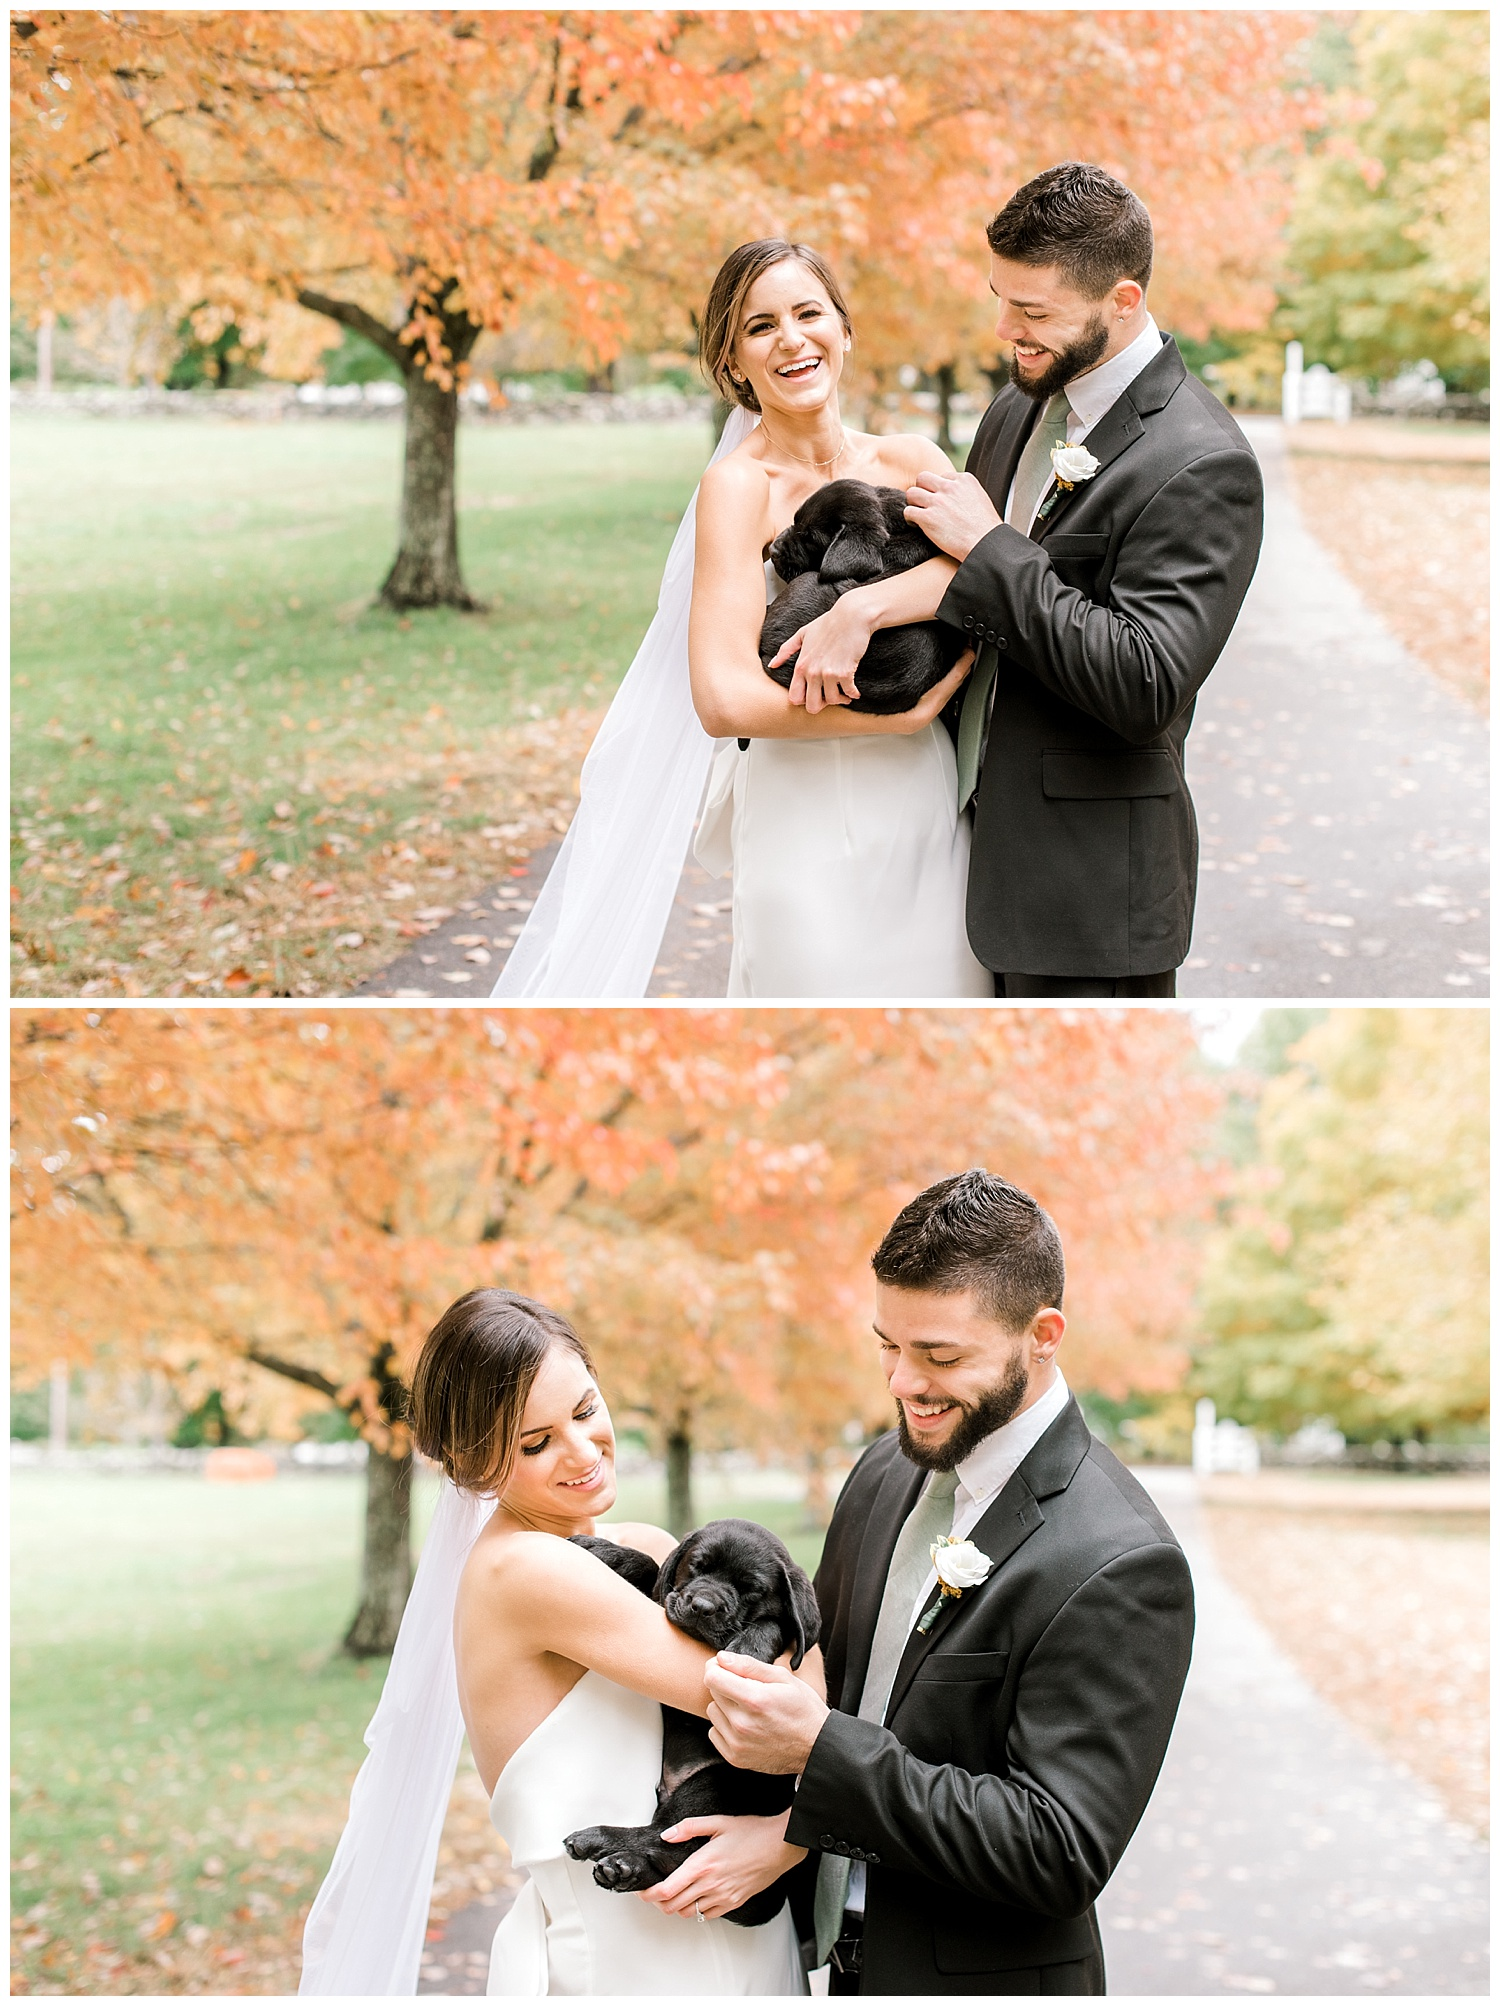 pompositticut-farm-fall-wedding-photography-hudson-massachusetts-photo-18.jpg